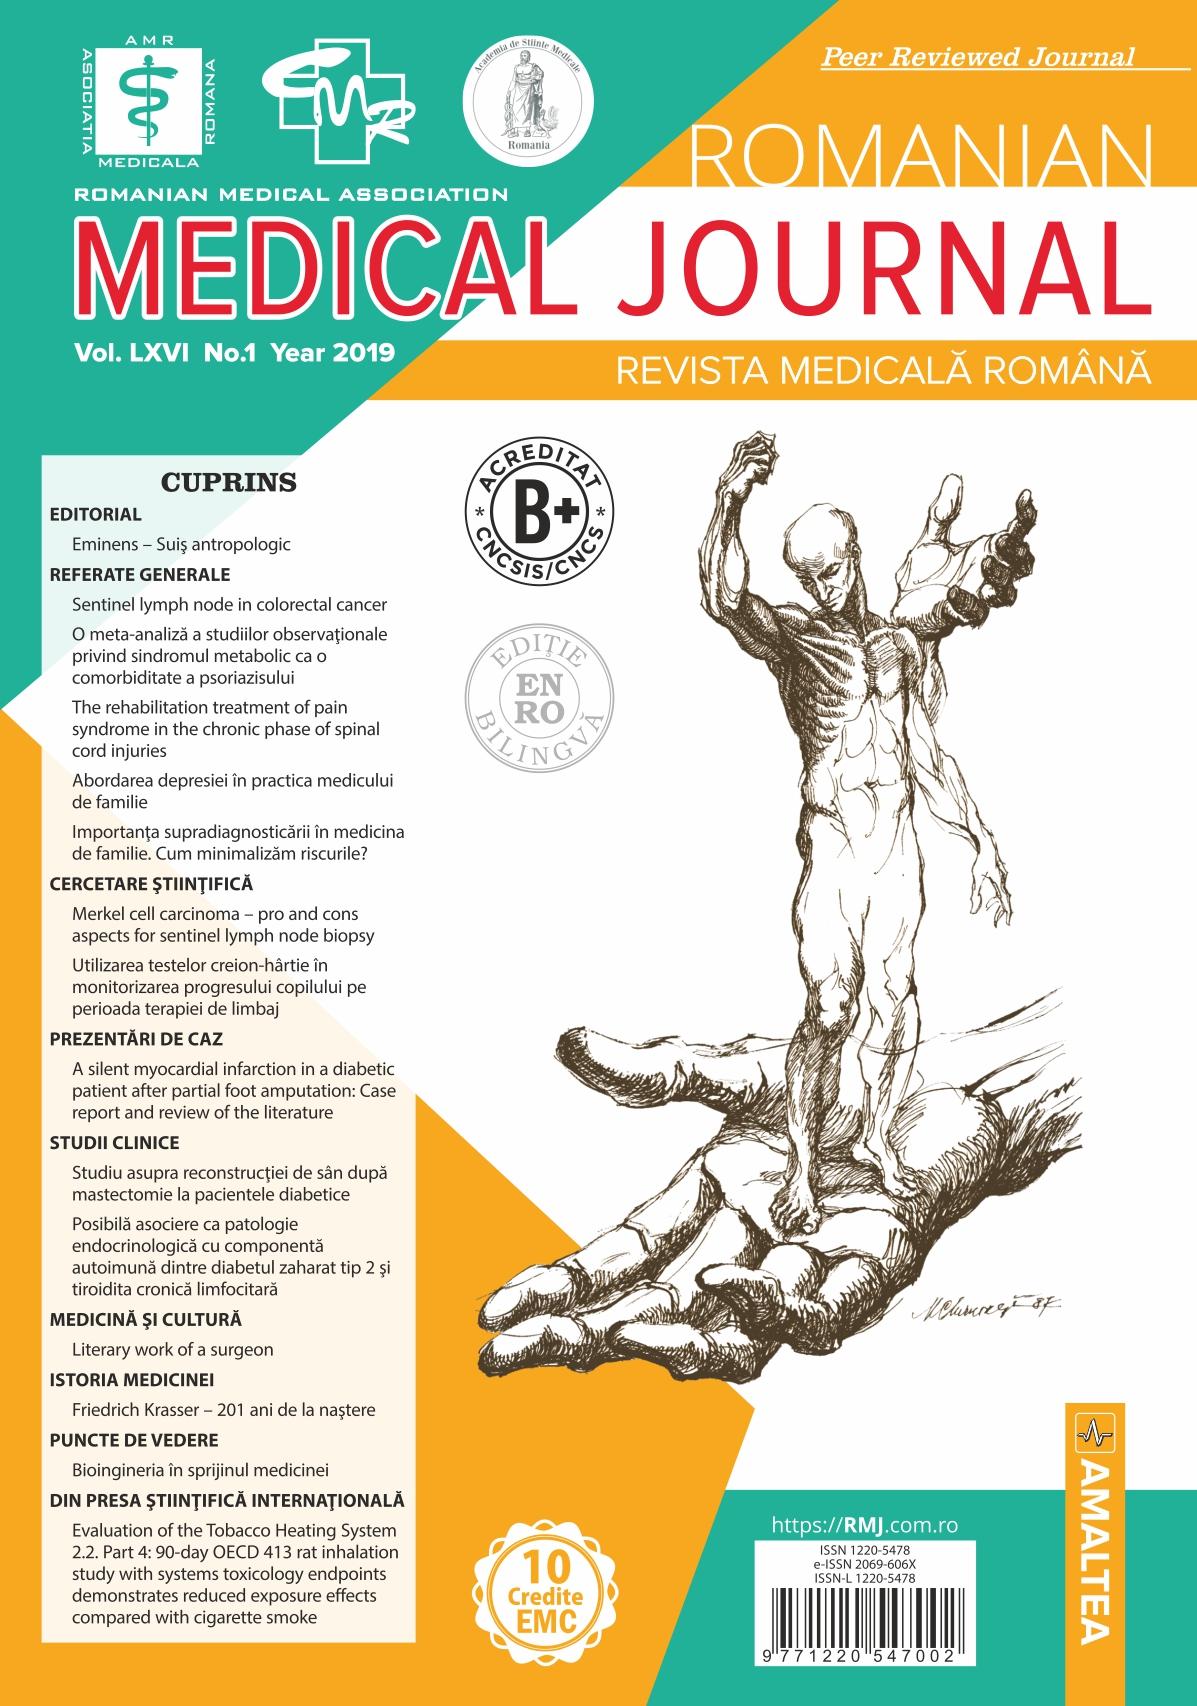 REVISTA MEDICALA ROMANA - Romanian Medical Journal, Vol. LXVI, No. 1, Year 2019